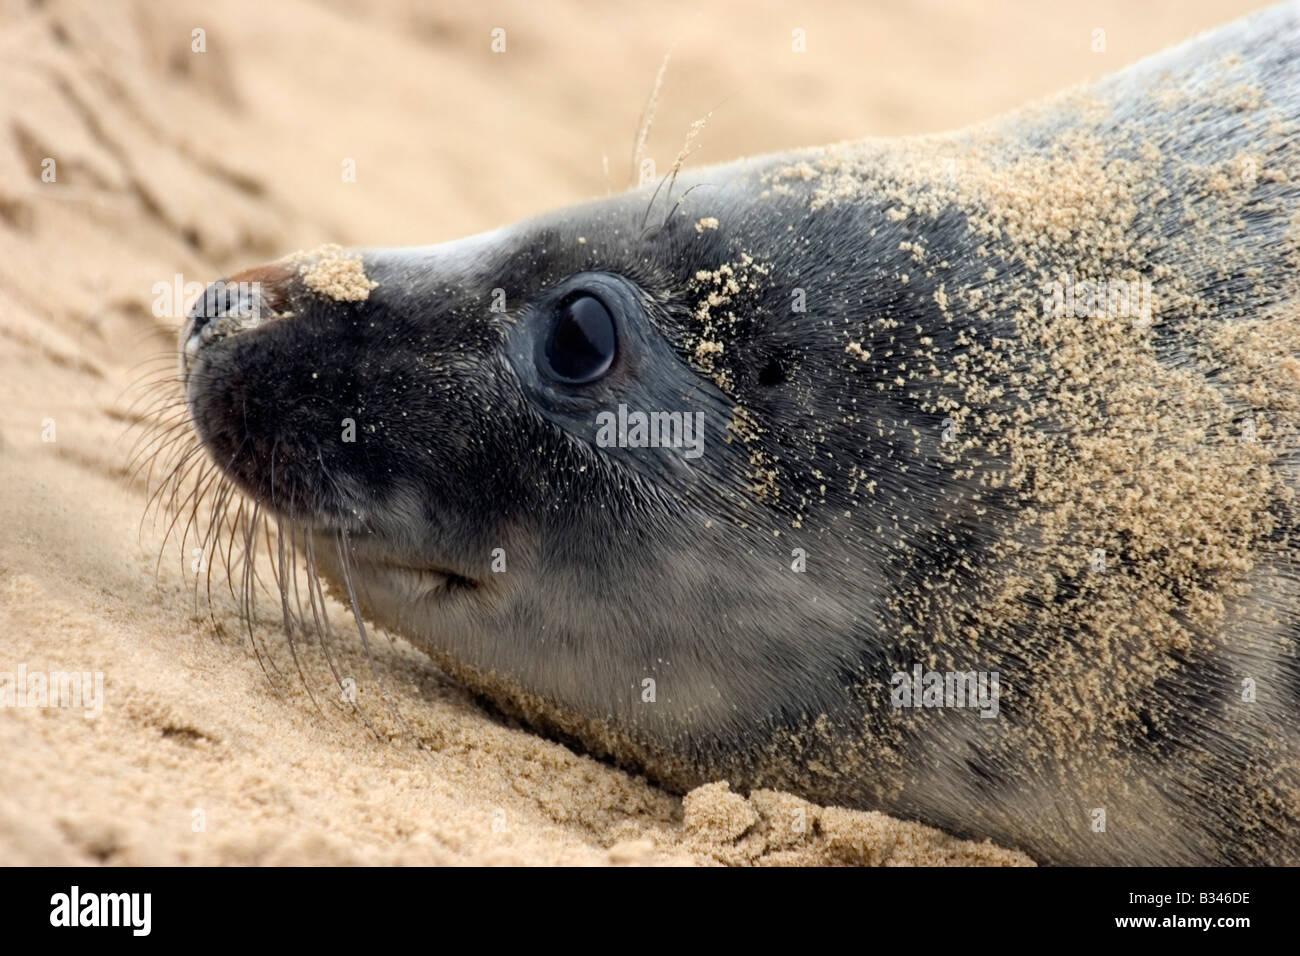 Grey Seal Pup am Strand, Porträt Stockbild